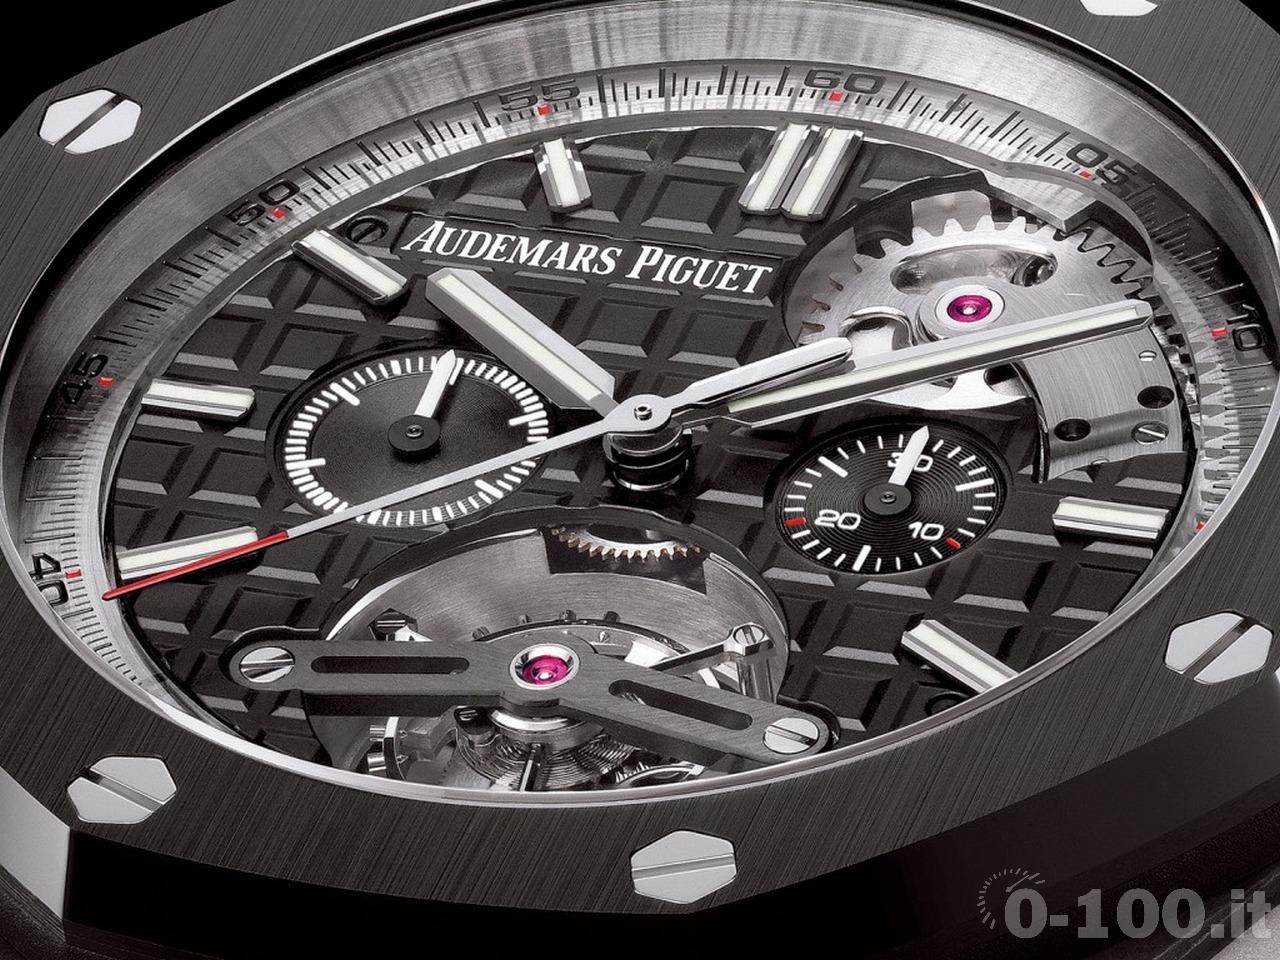 anteprima-watches-wonders-2014-hong-kong-audemars-piguet-royal-oak-offshore-tourbillon-cronografo-automatico-0-100_4